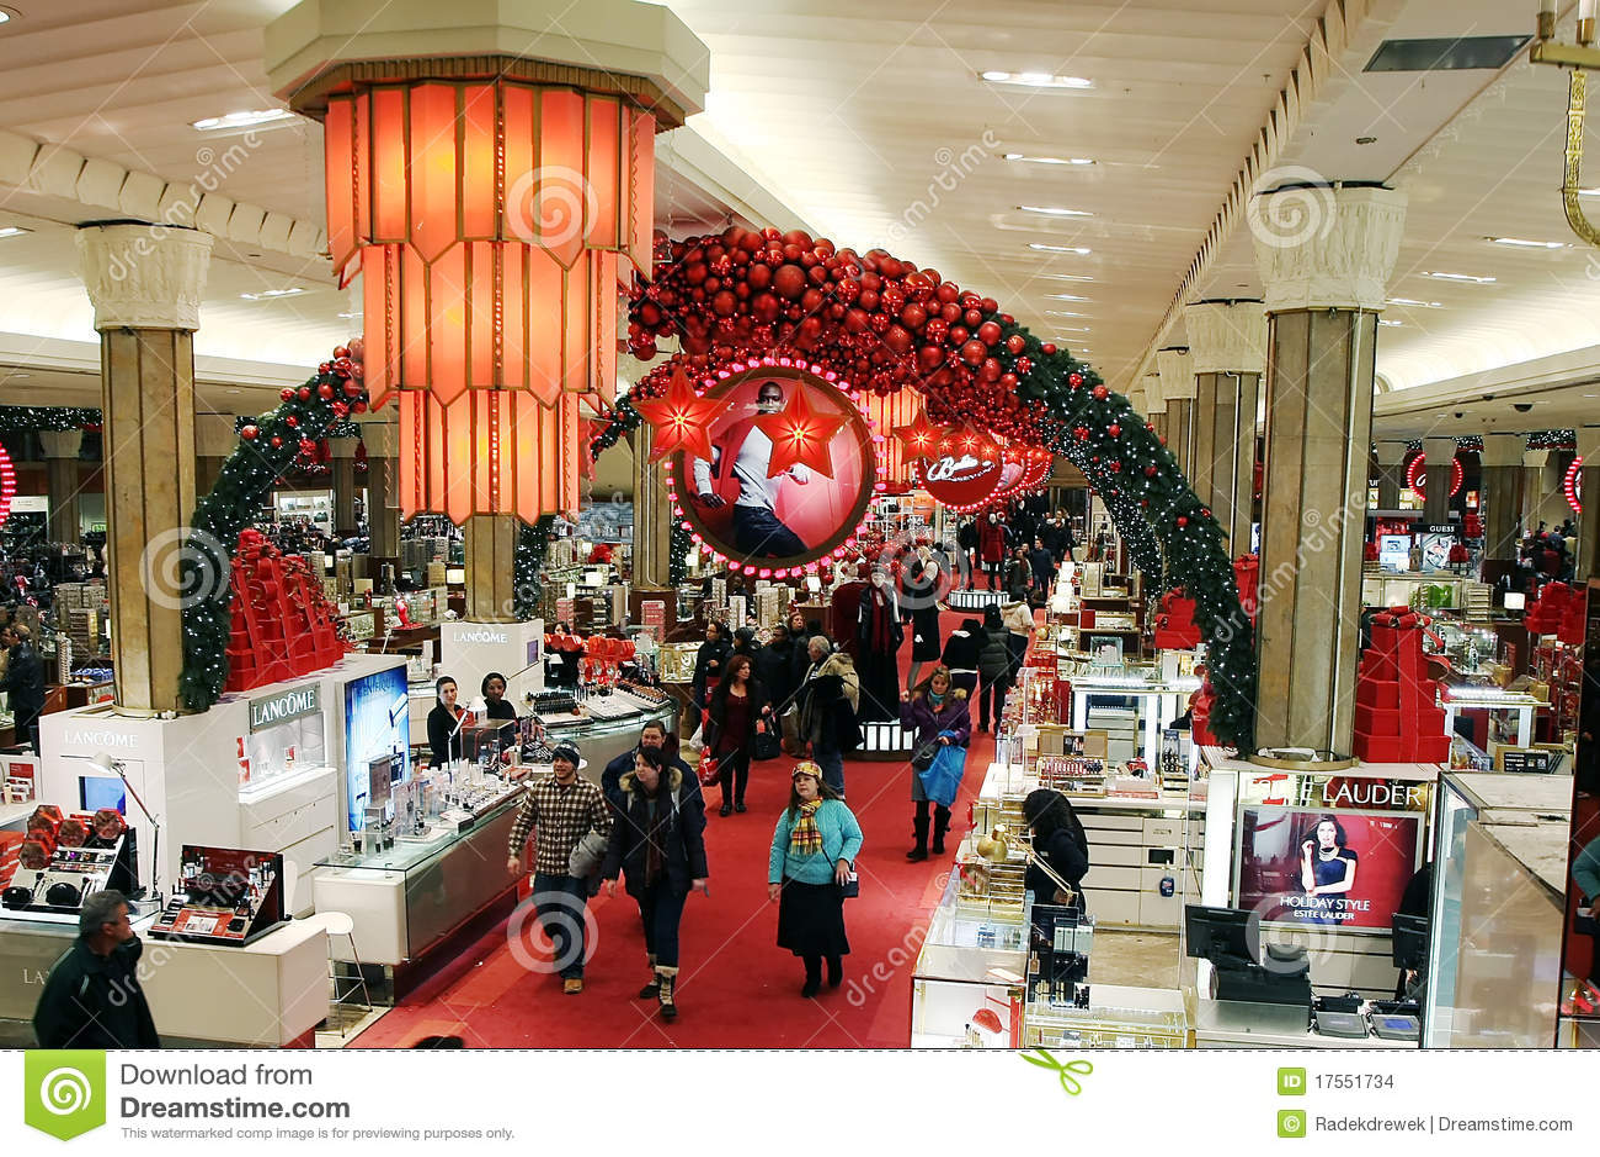 Macys Christmas Decoration Editorial Stock Image - Image: 17551734